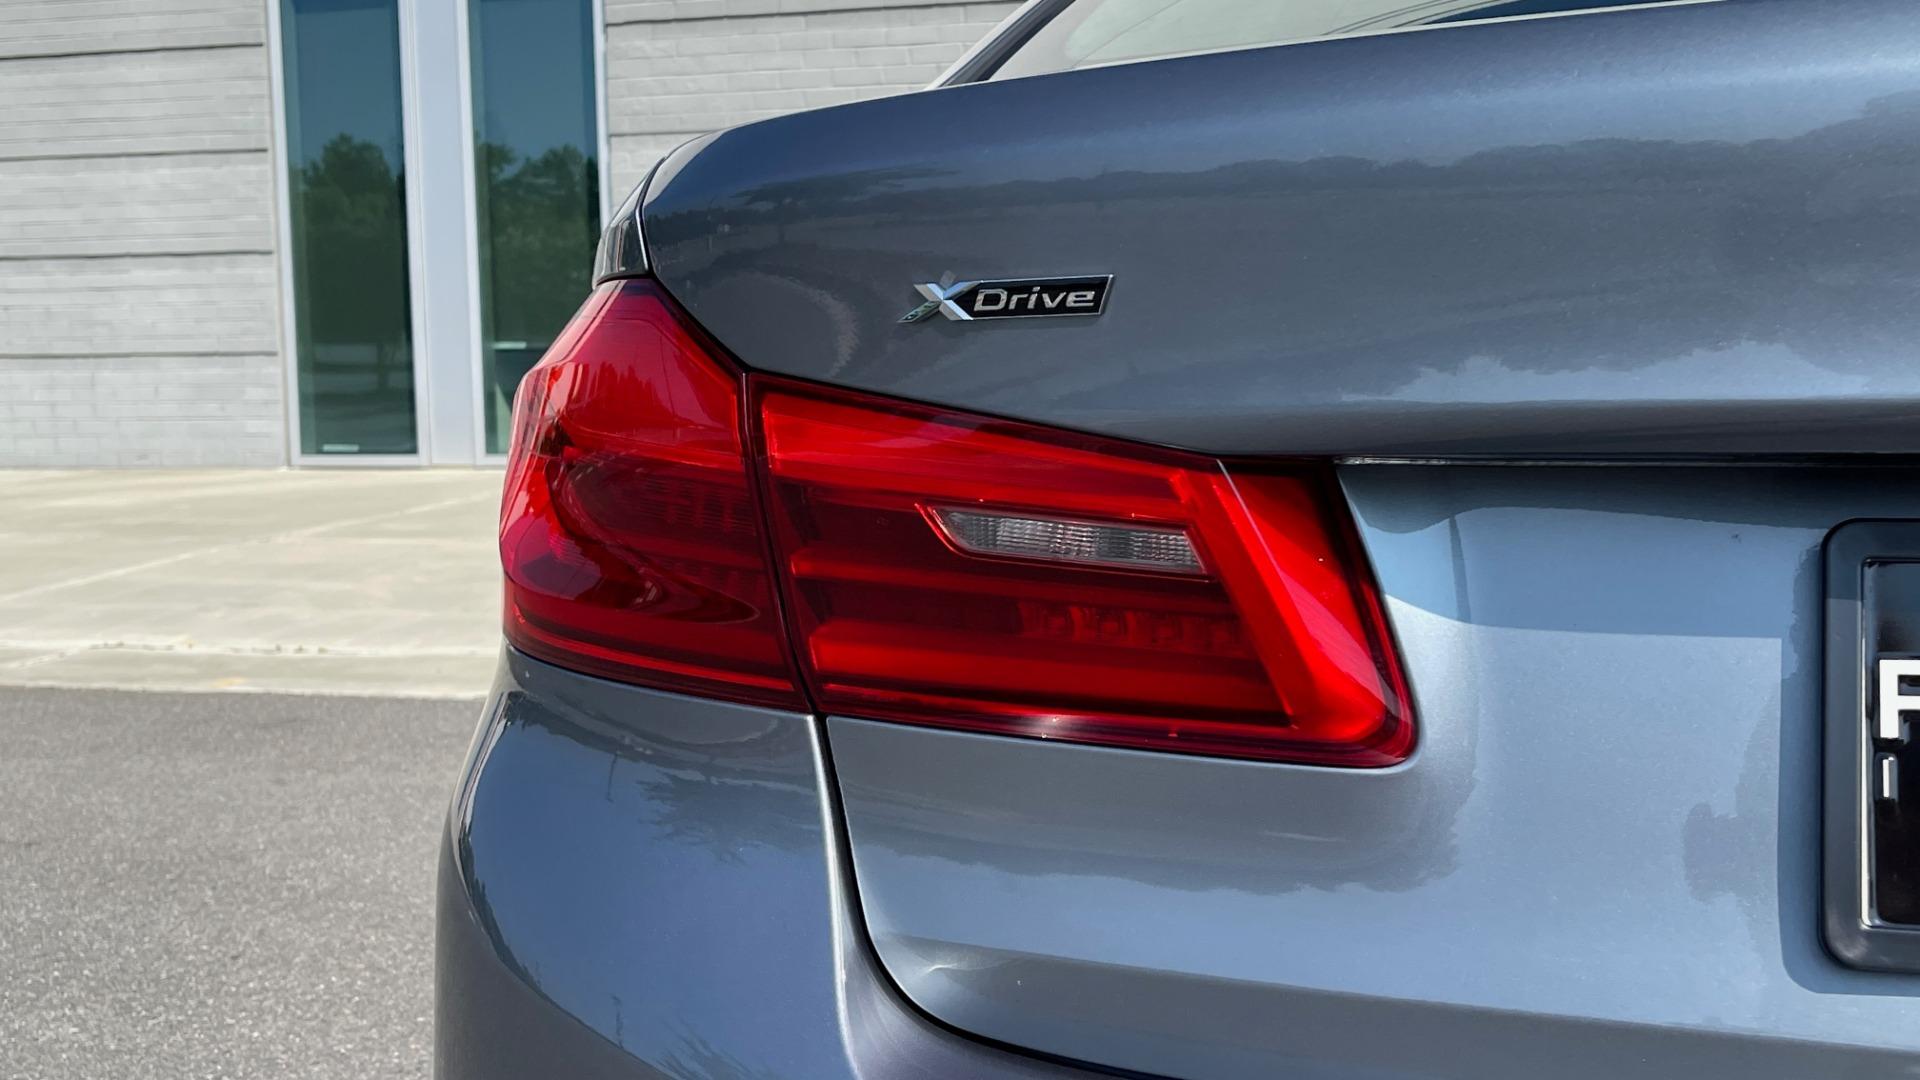 Used 2018 BMW 5 SERIES 540I XDRIVE M-SPORT / DRVR ASST / PDC / APPLE / HUD / H/K SND for sale $42,795 at Formula Imports in Charlotte NC 28227 23